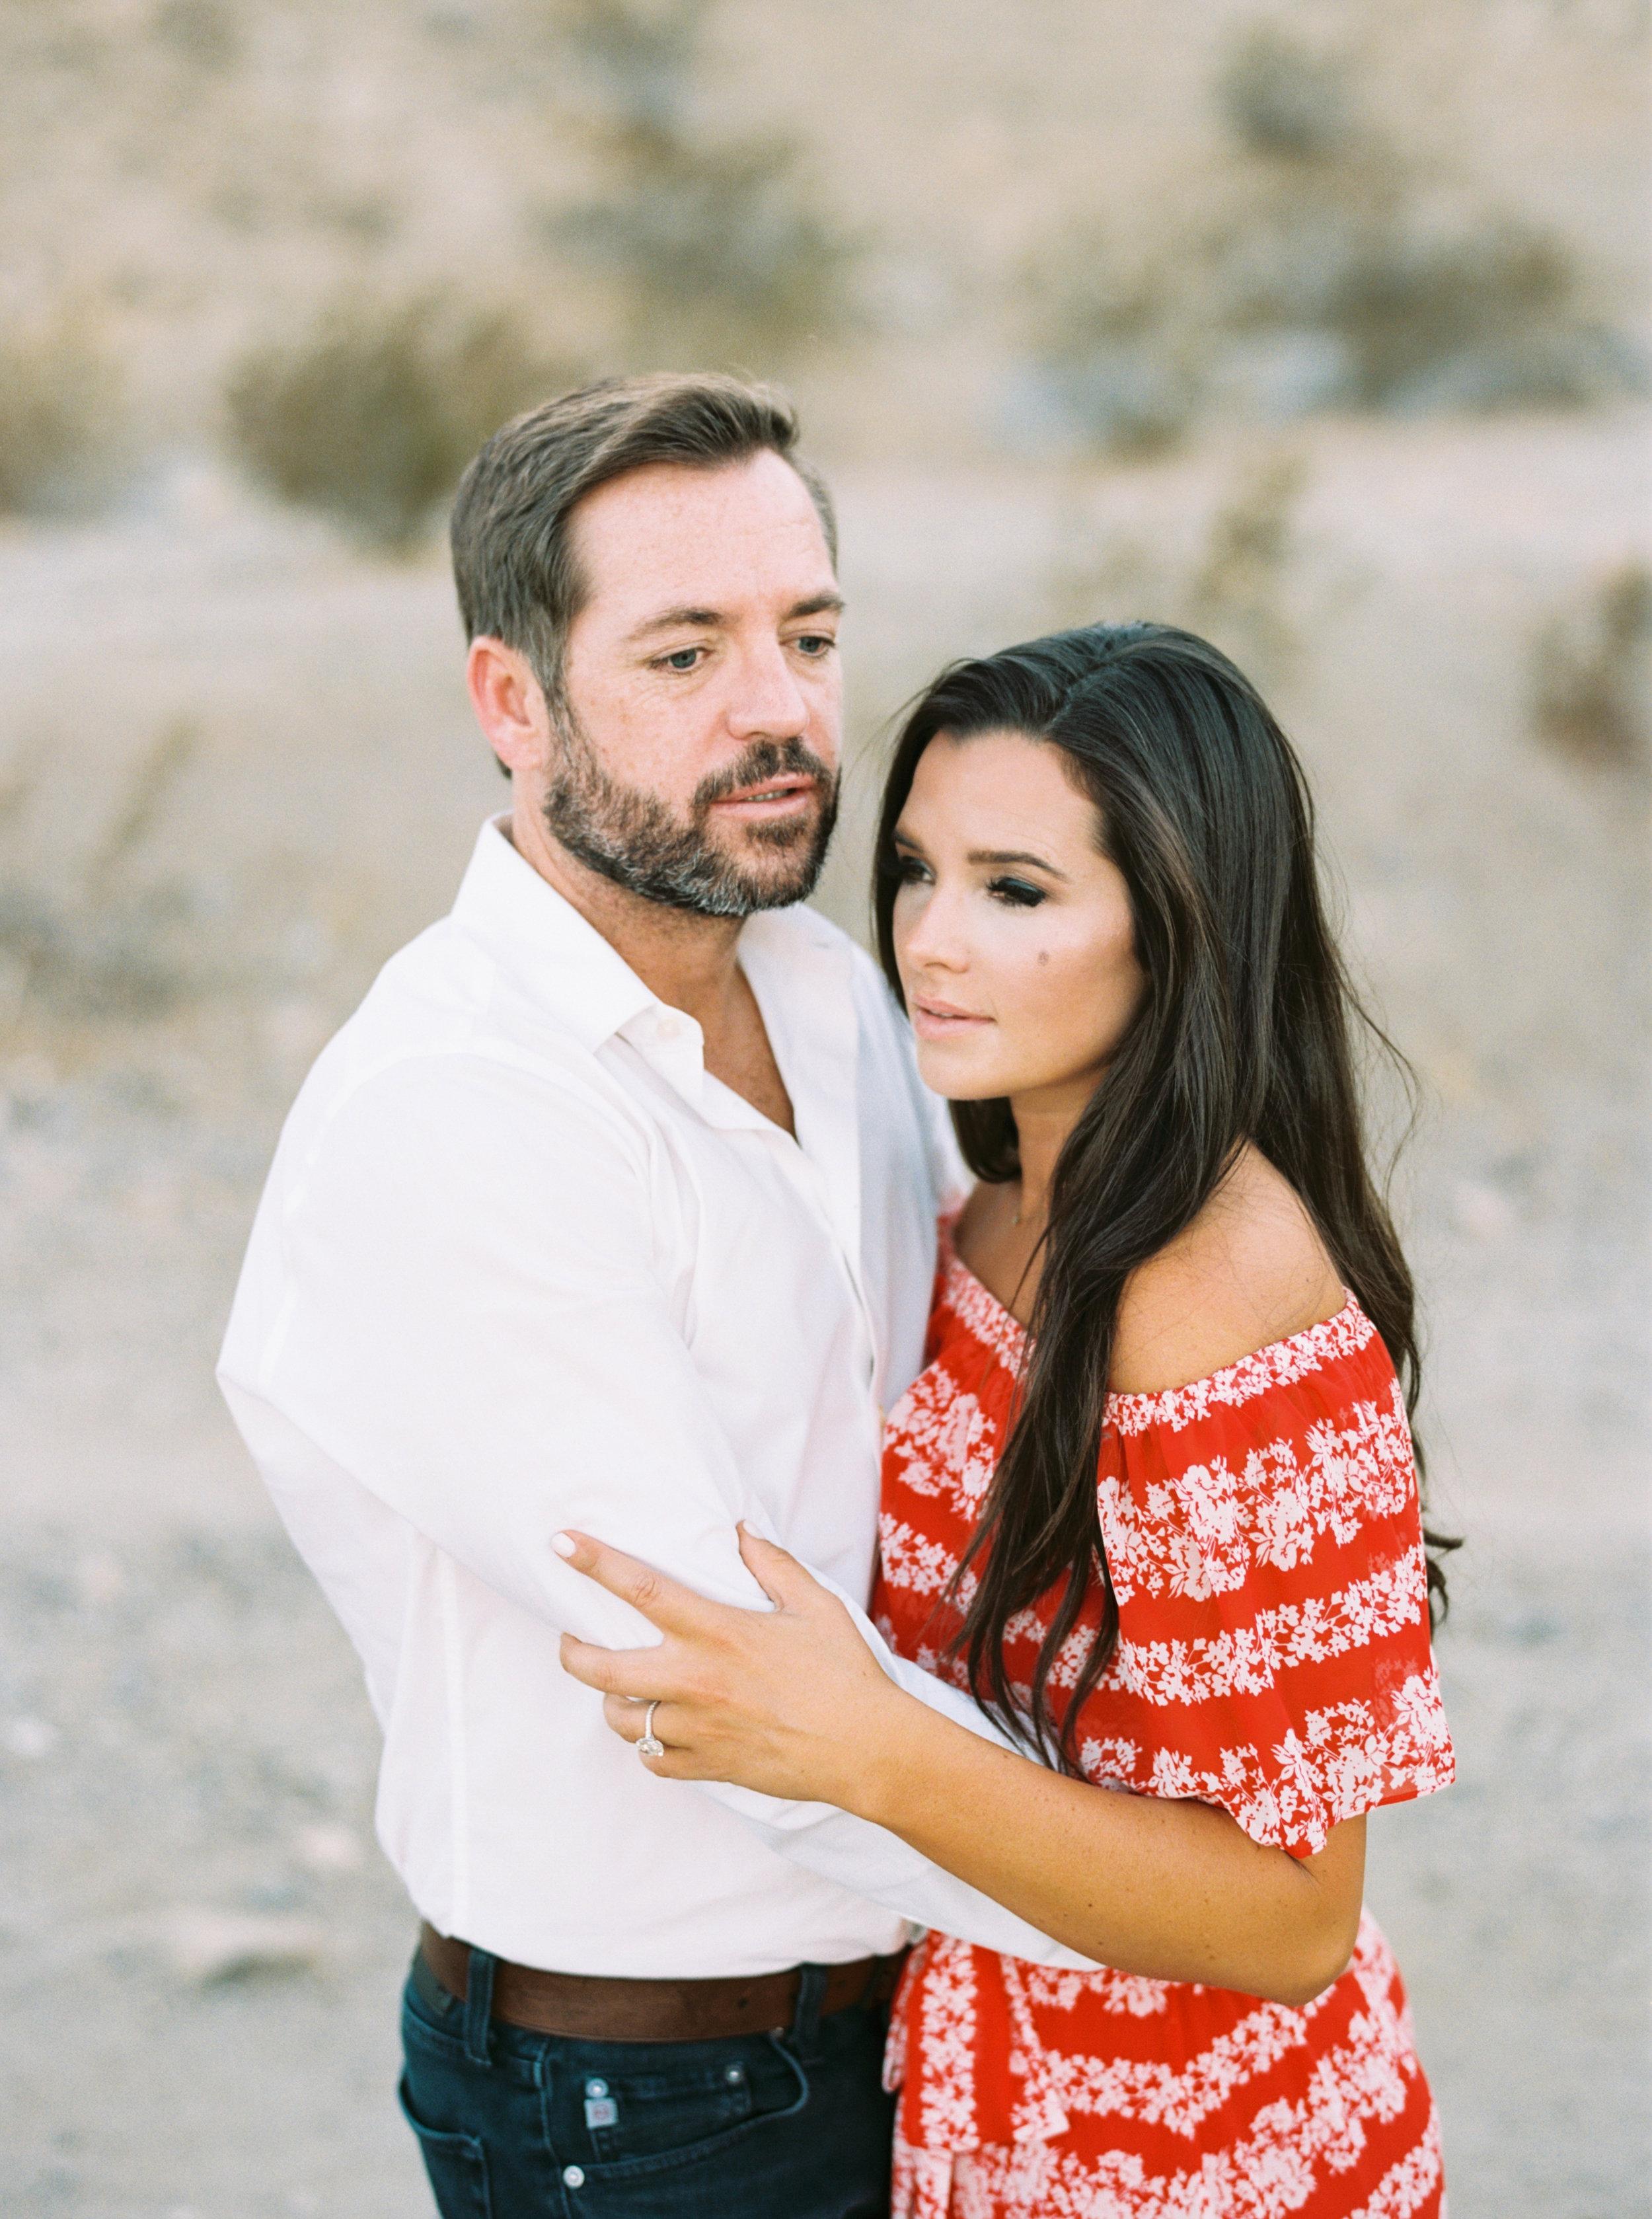 Palm Sprinsg Wedding Photographer Jenny Losee (27 of 32).jpg